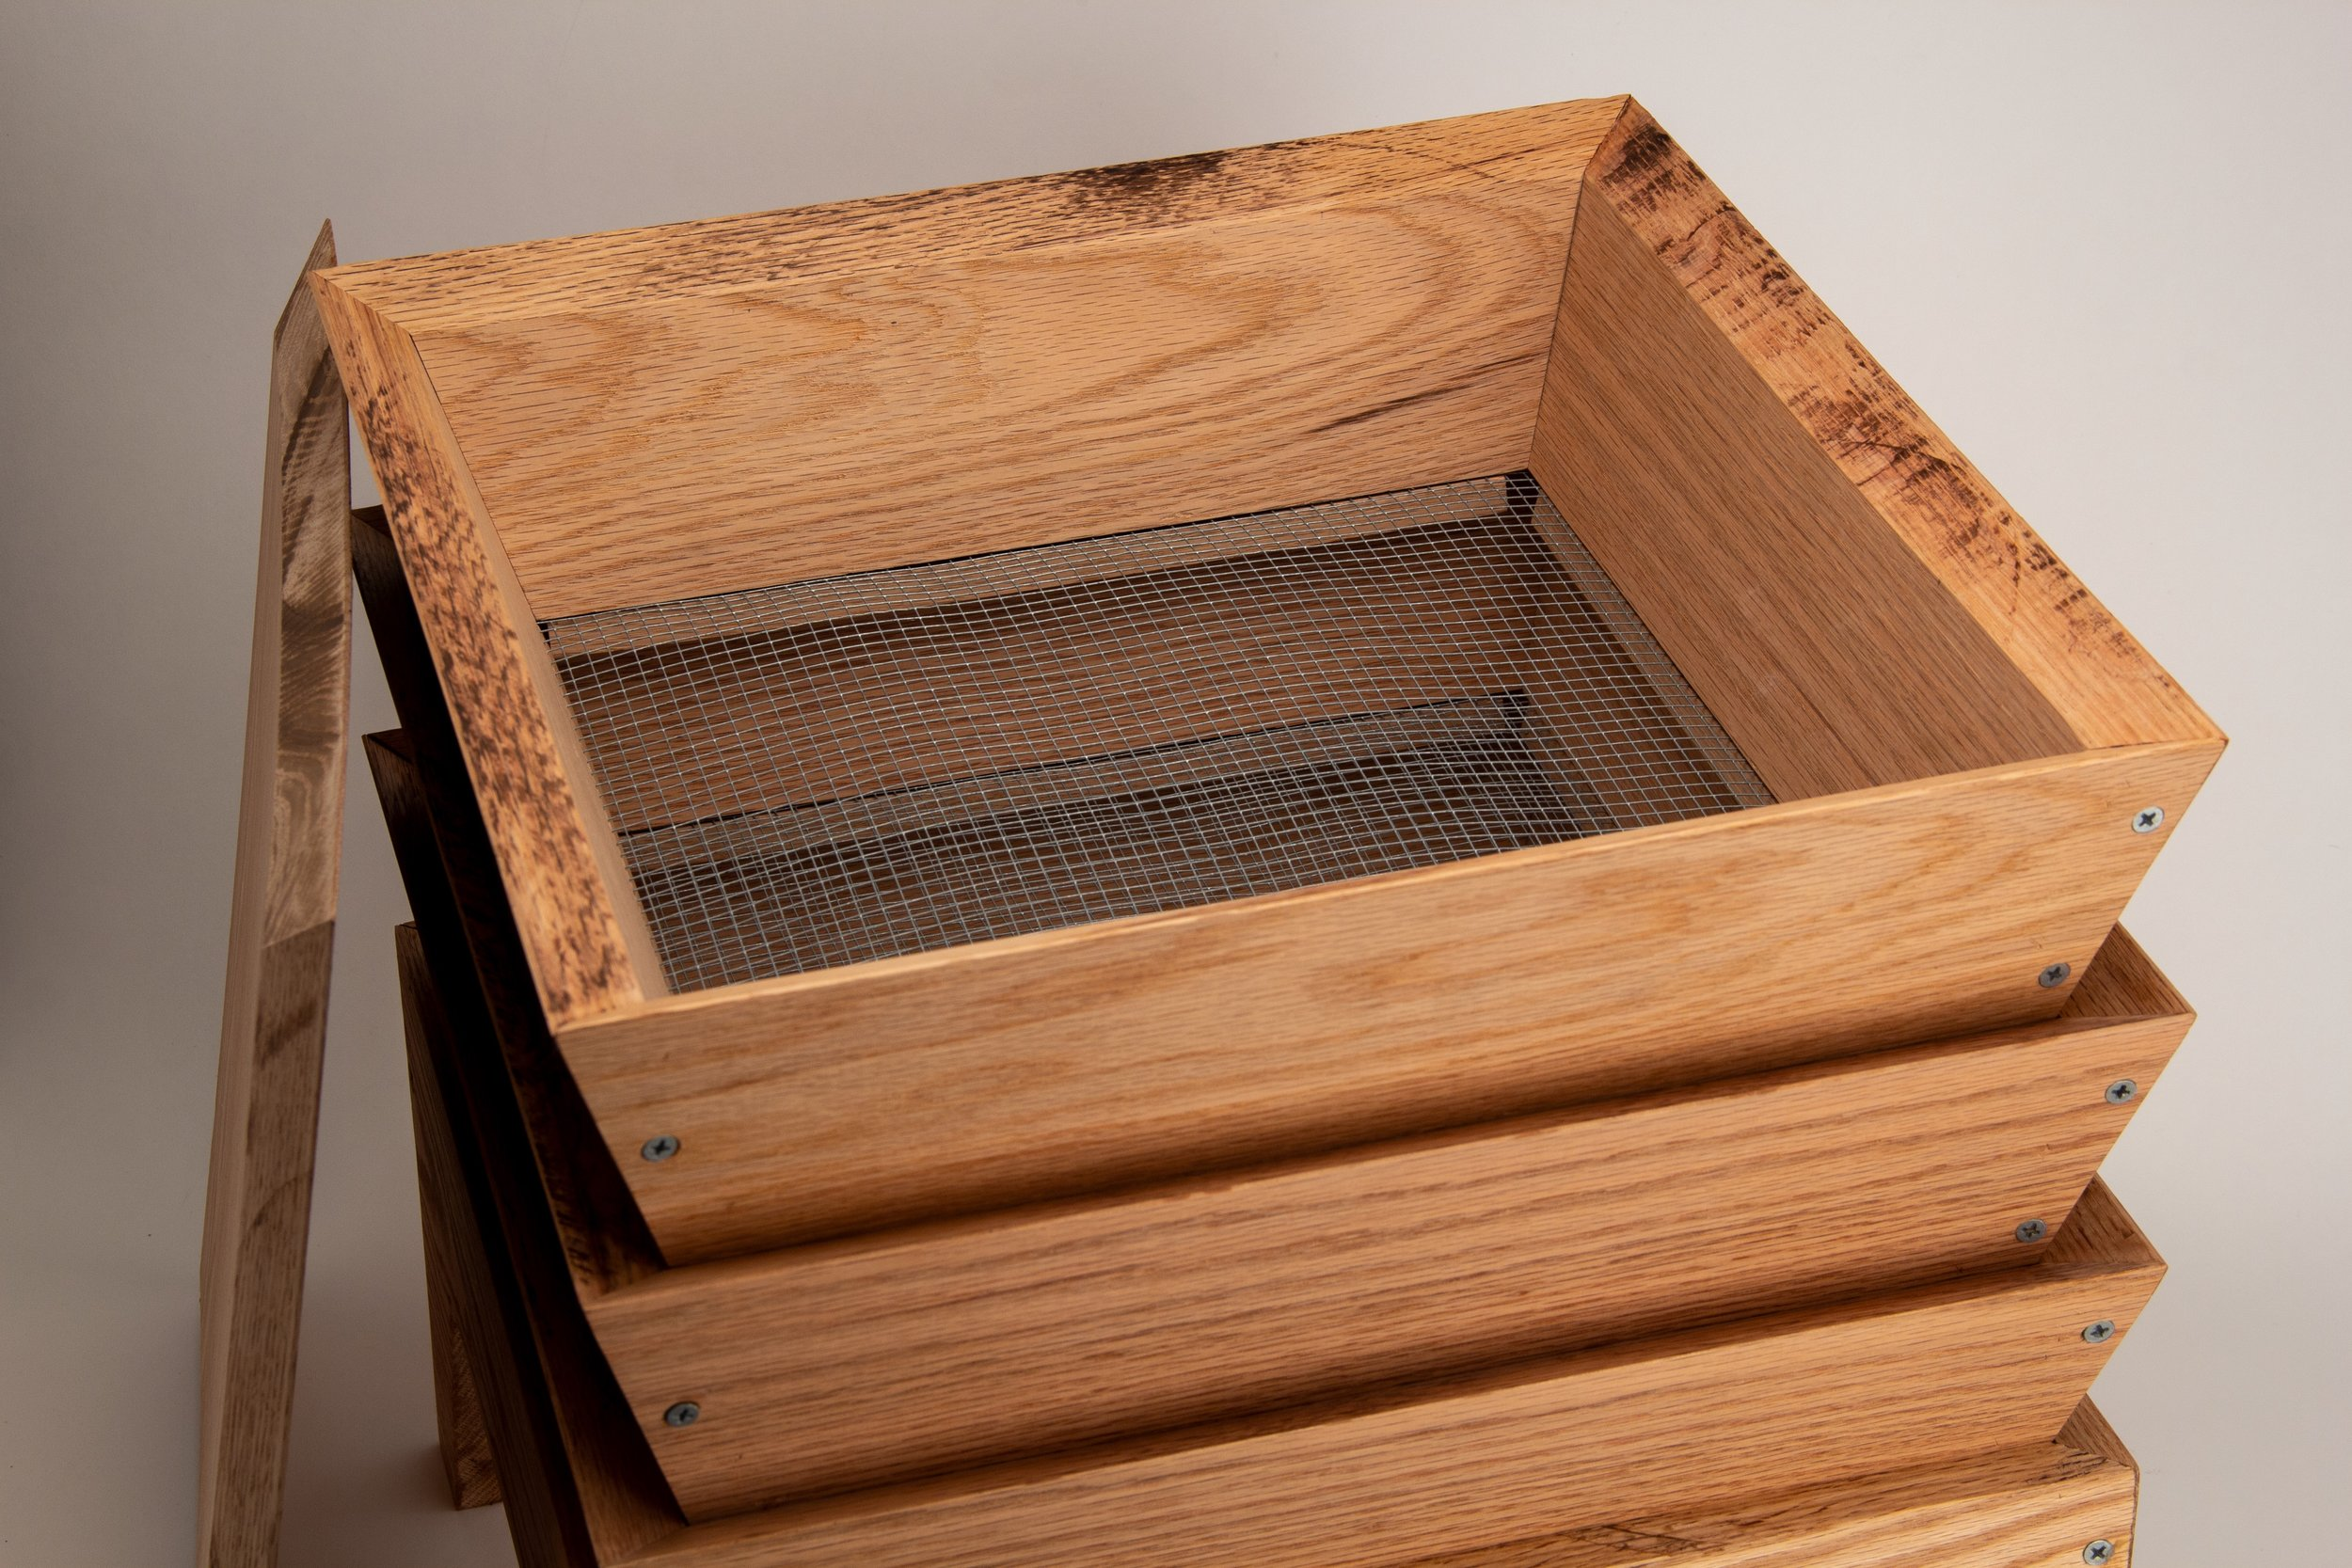 three-tier vermicompost